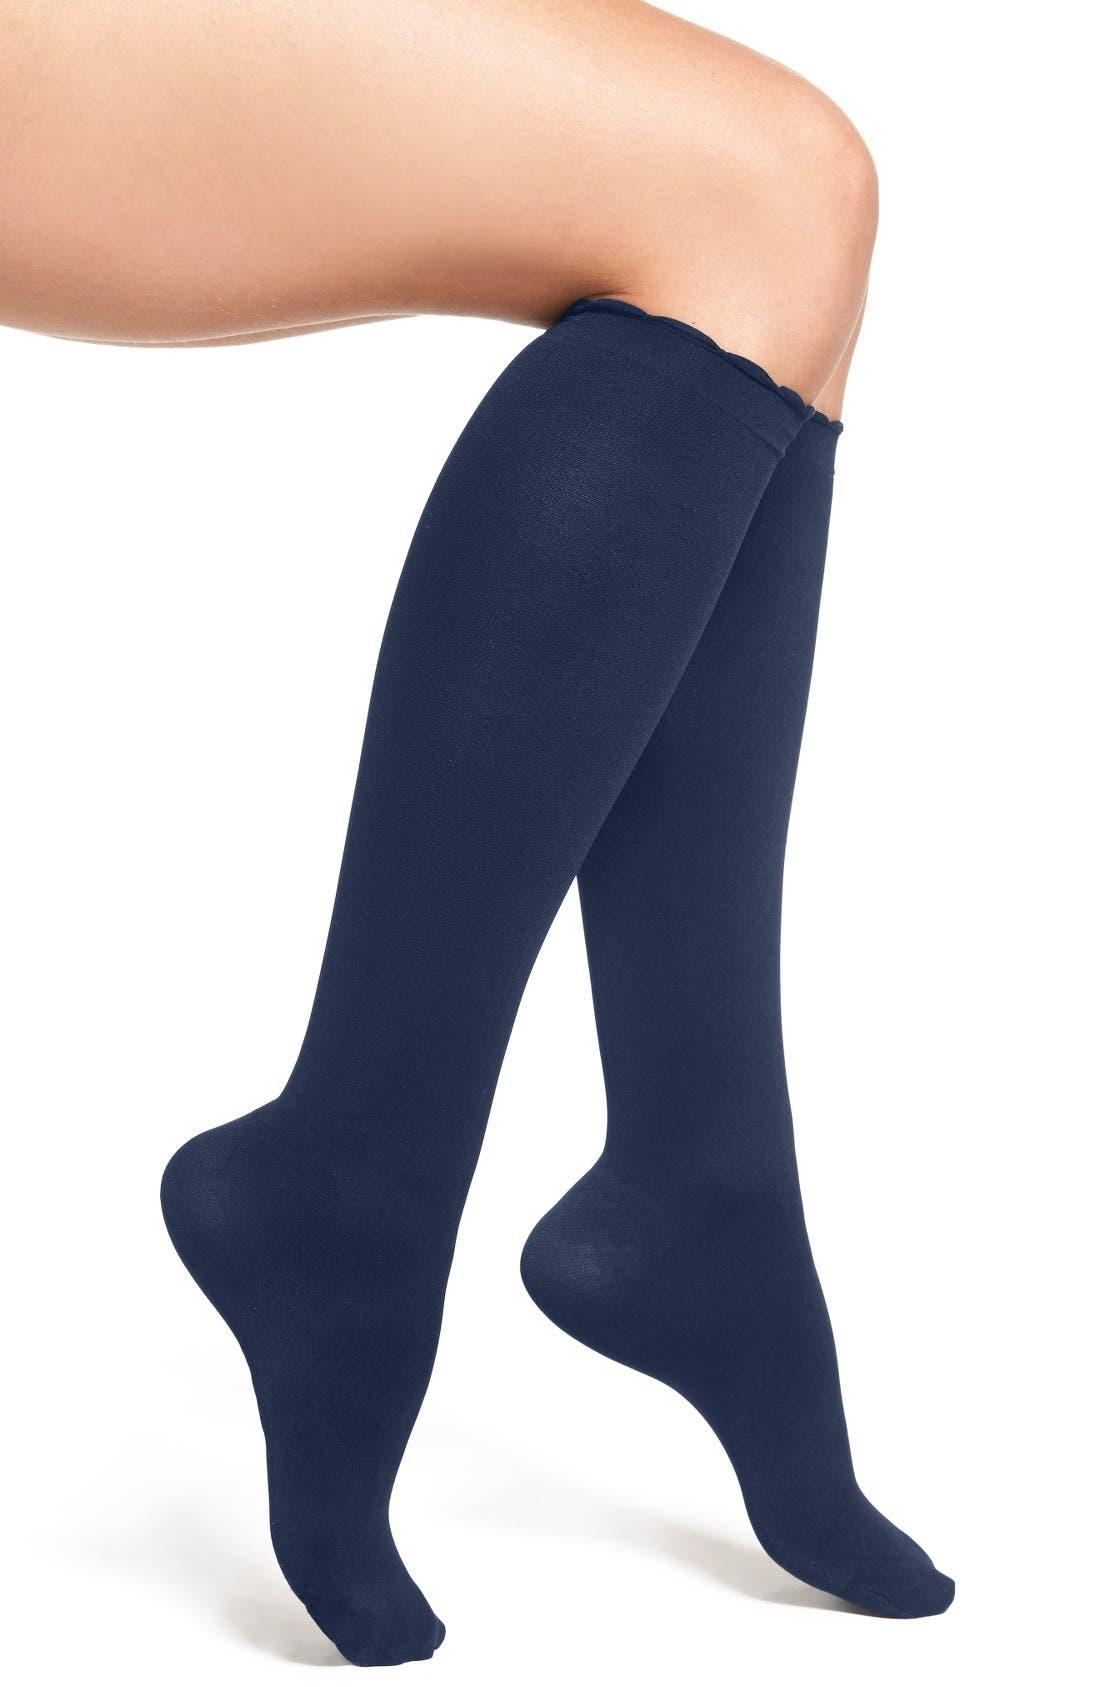 Compression Trouser Socks,                             Main thumbnail 1, color,                             NAVY